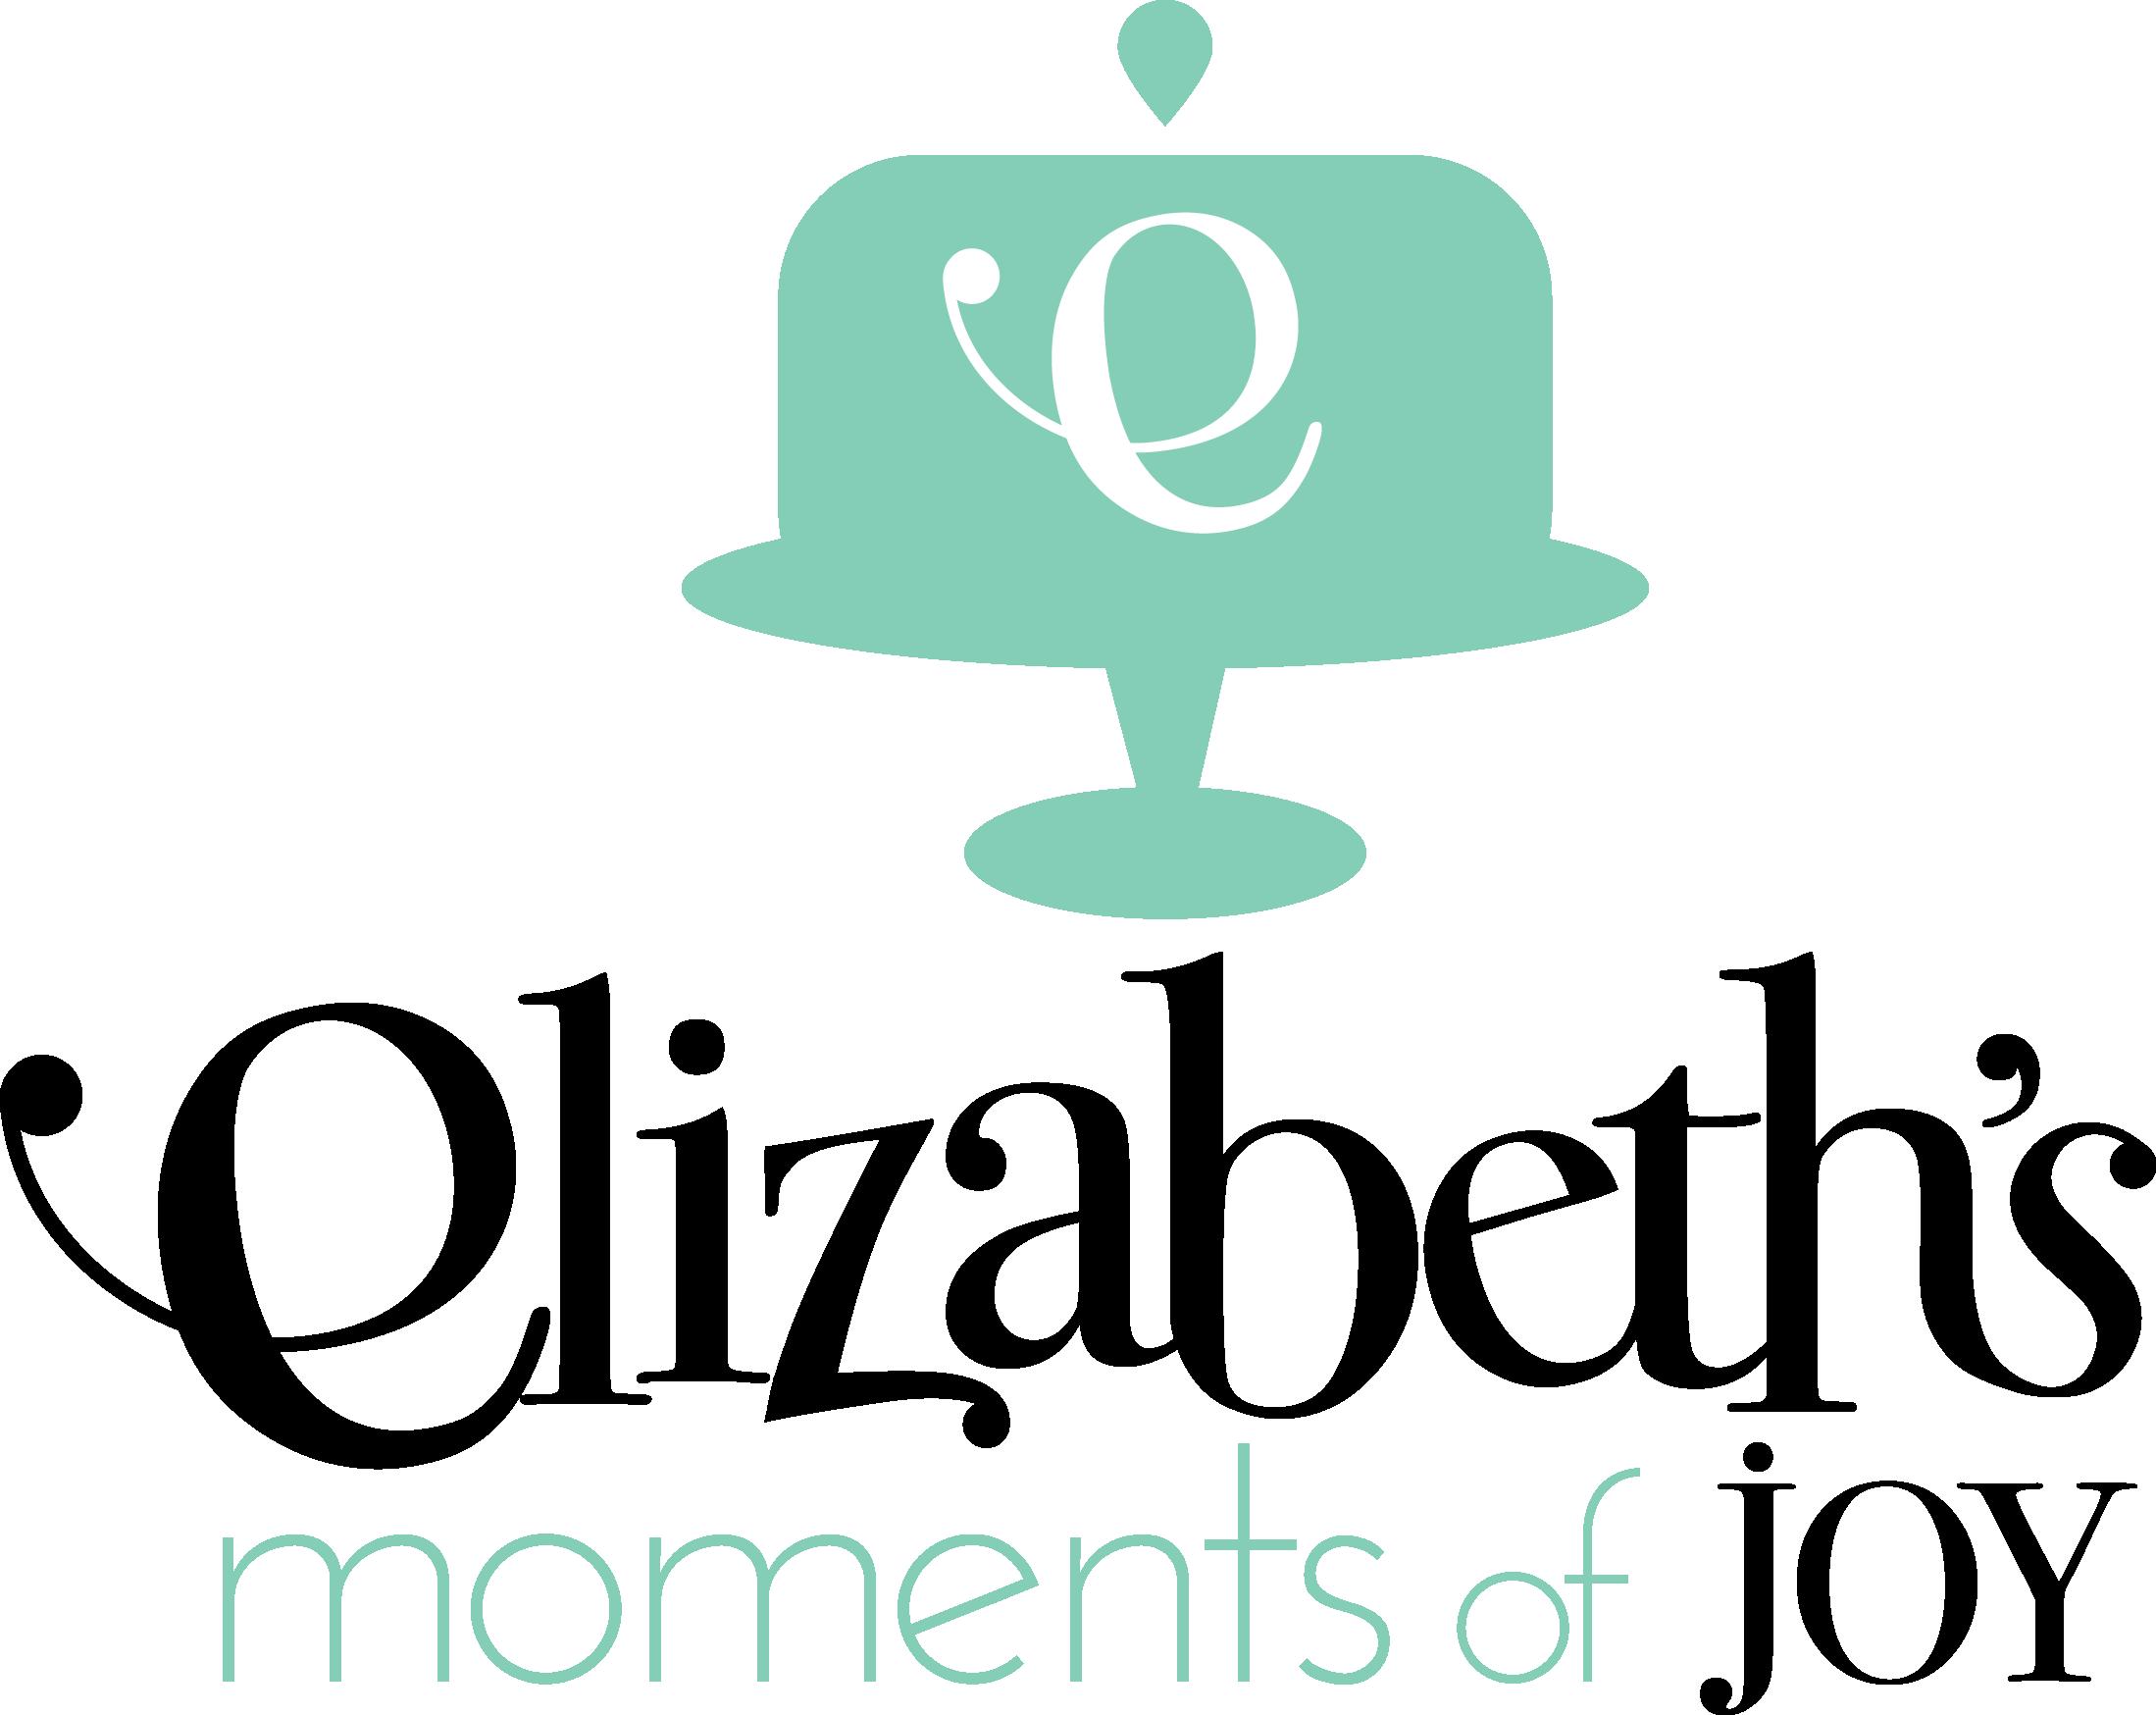 Logo Design For a Gourmet Bakery (Elizabeth's Moments of